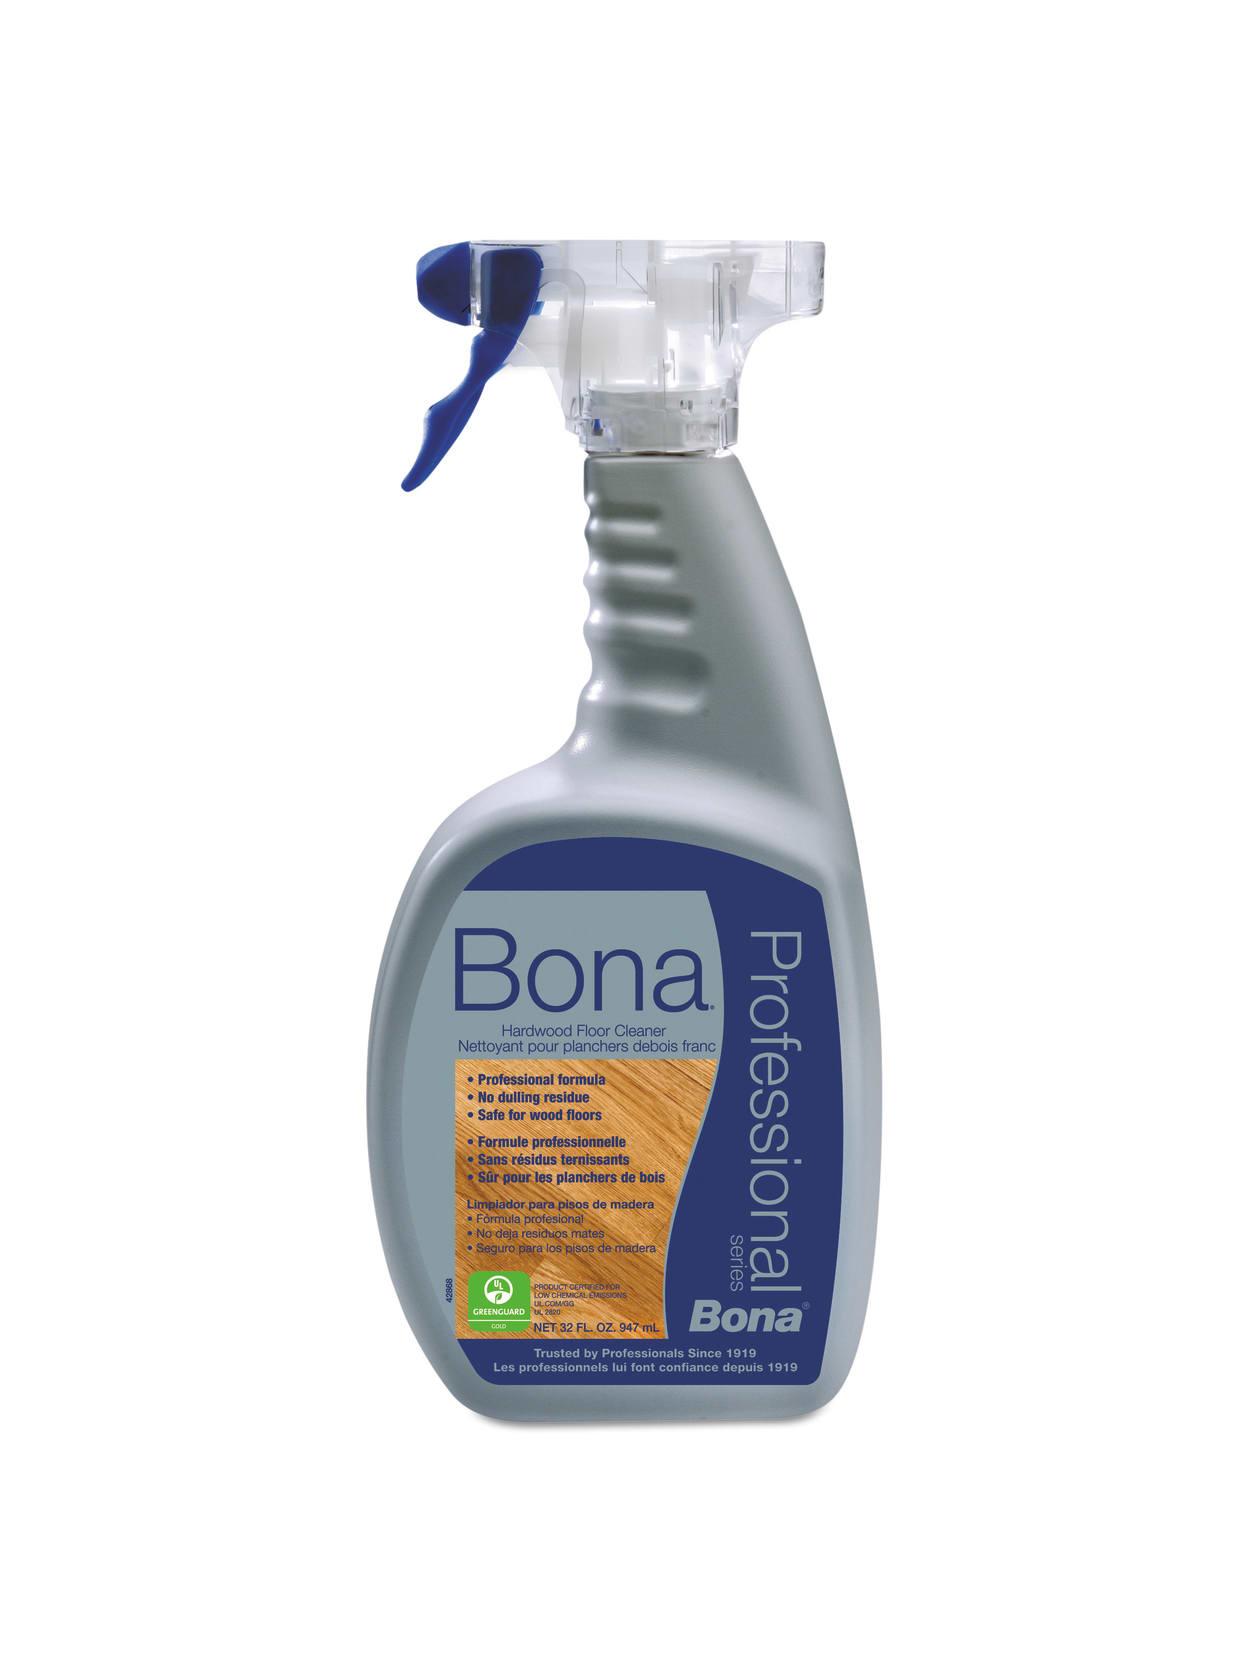 Bona Hardwood Floor Cleaner 32 Oz Spray